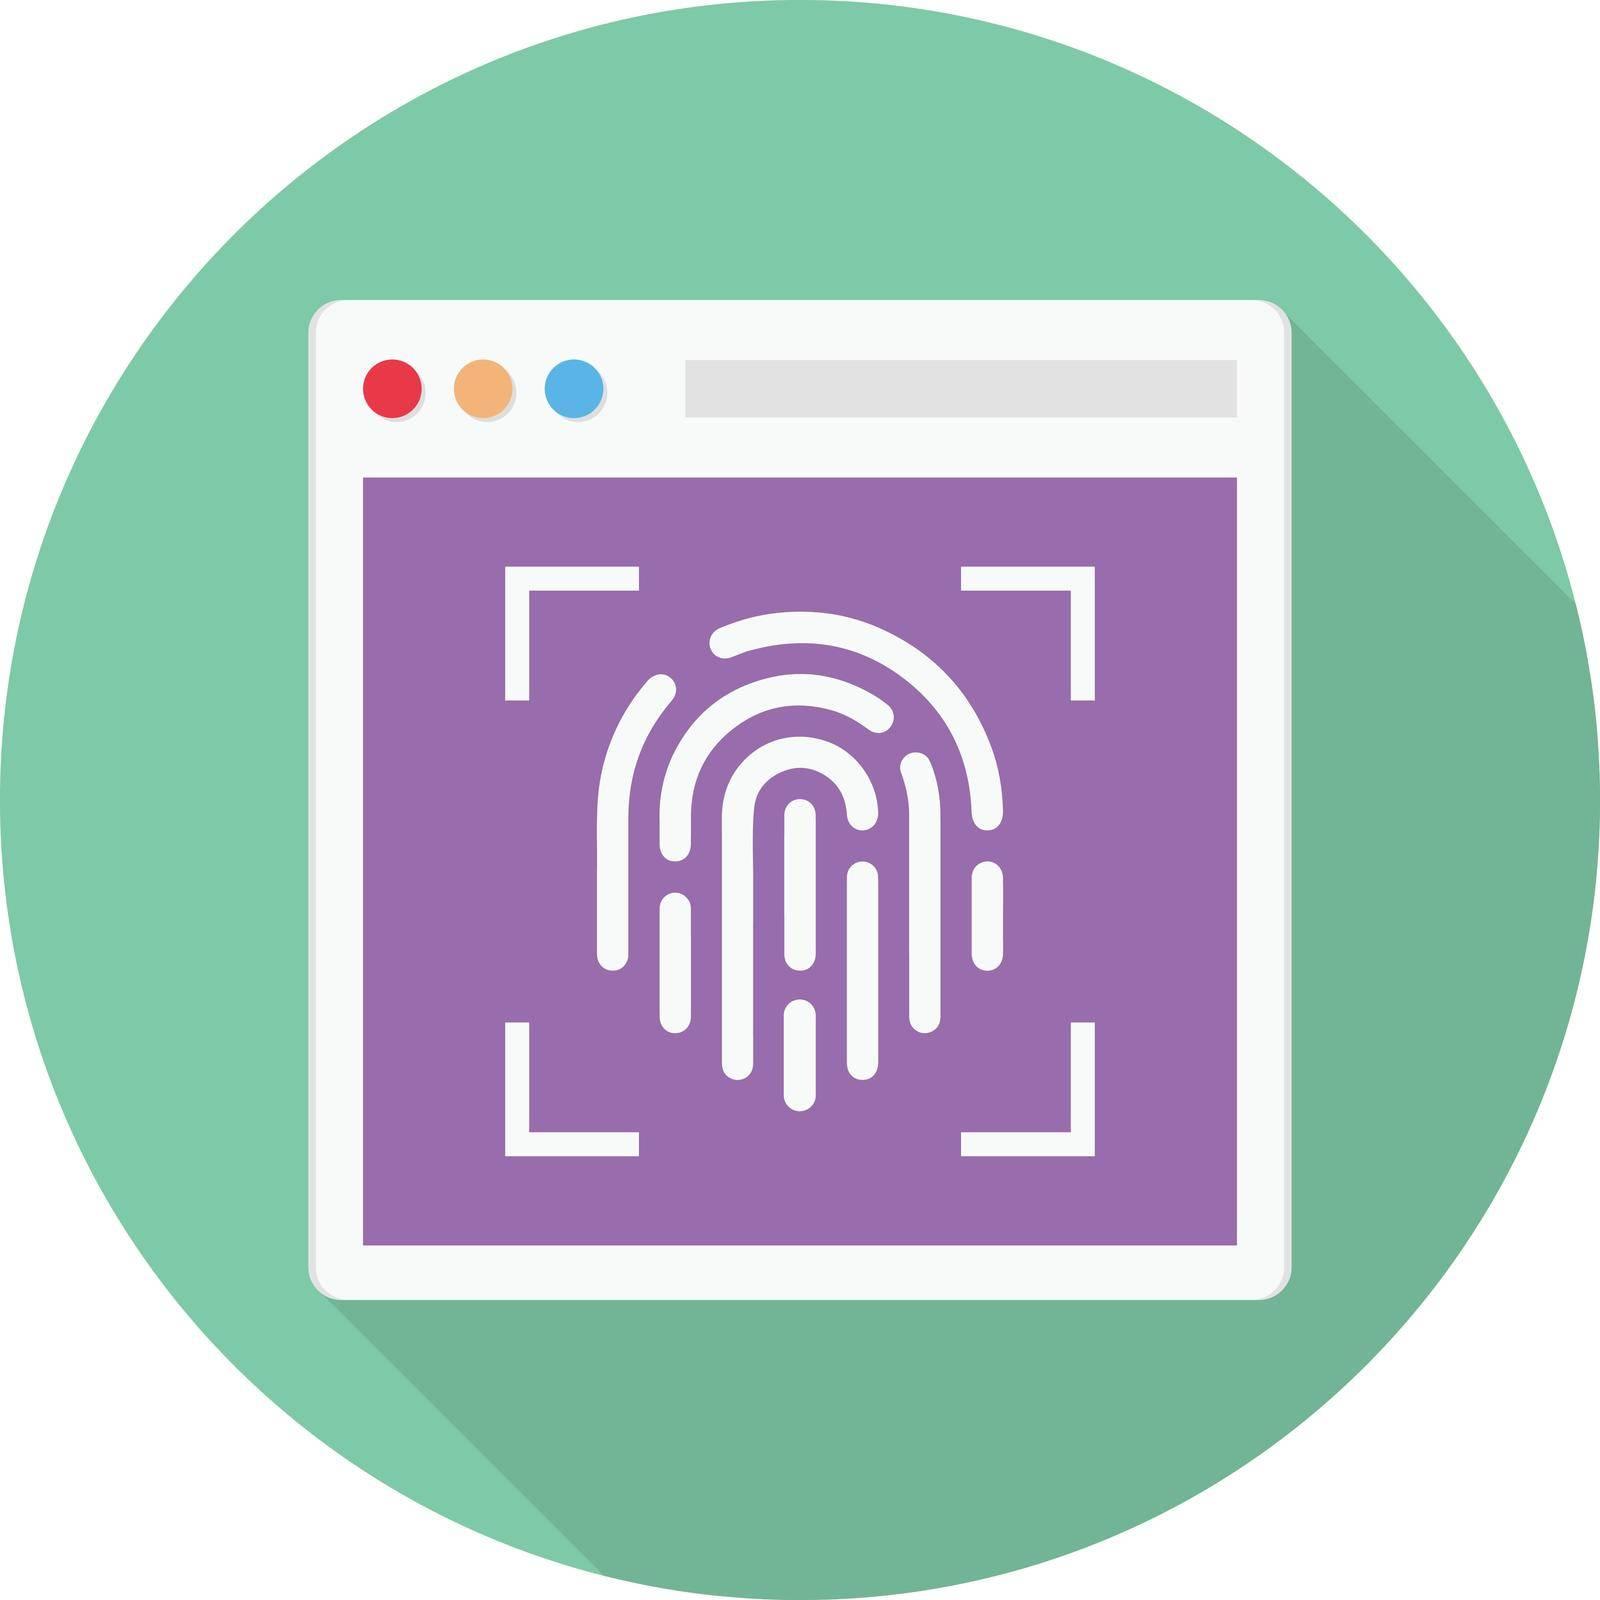 fingerprint vector circle shadow flat icon